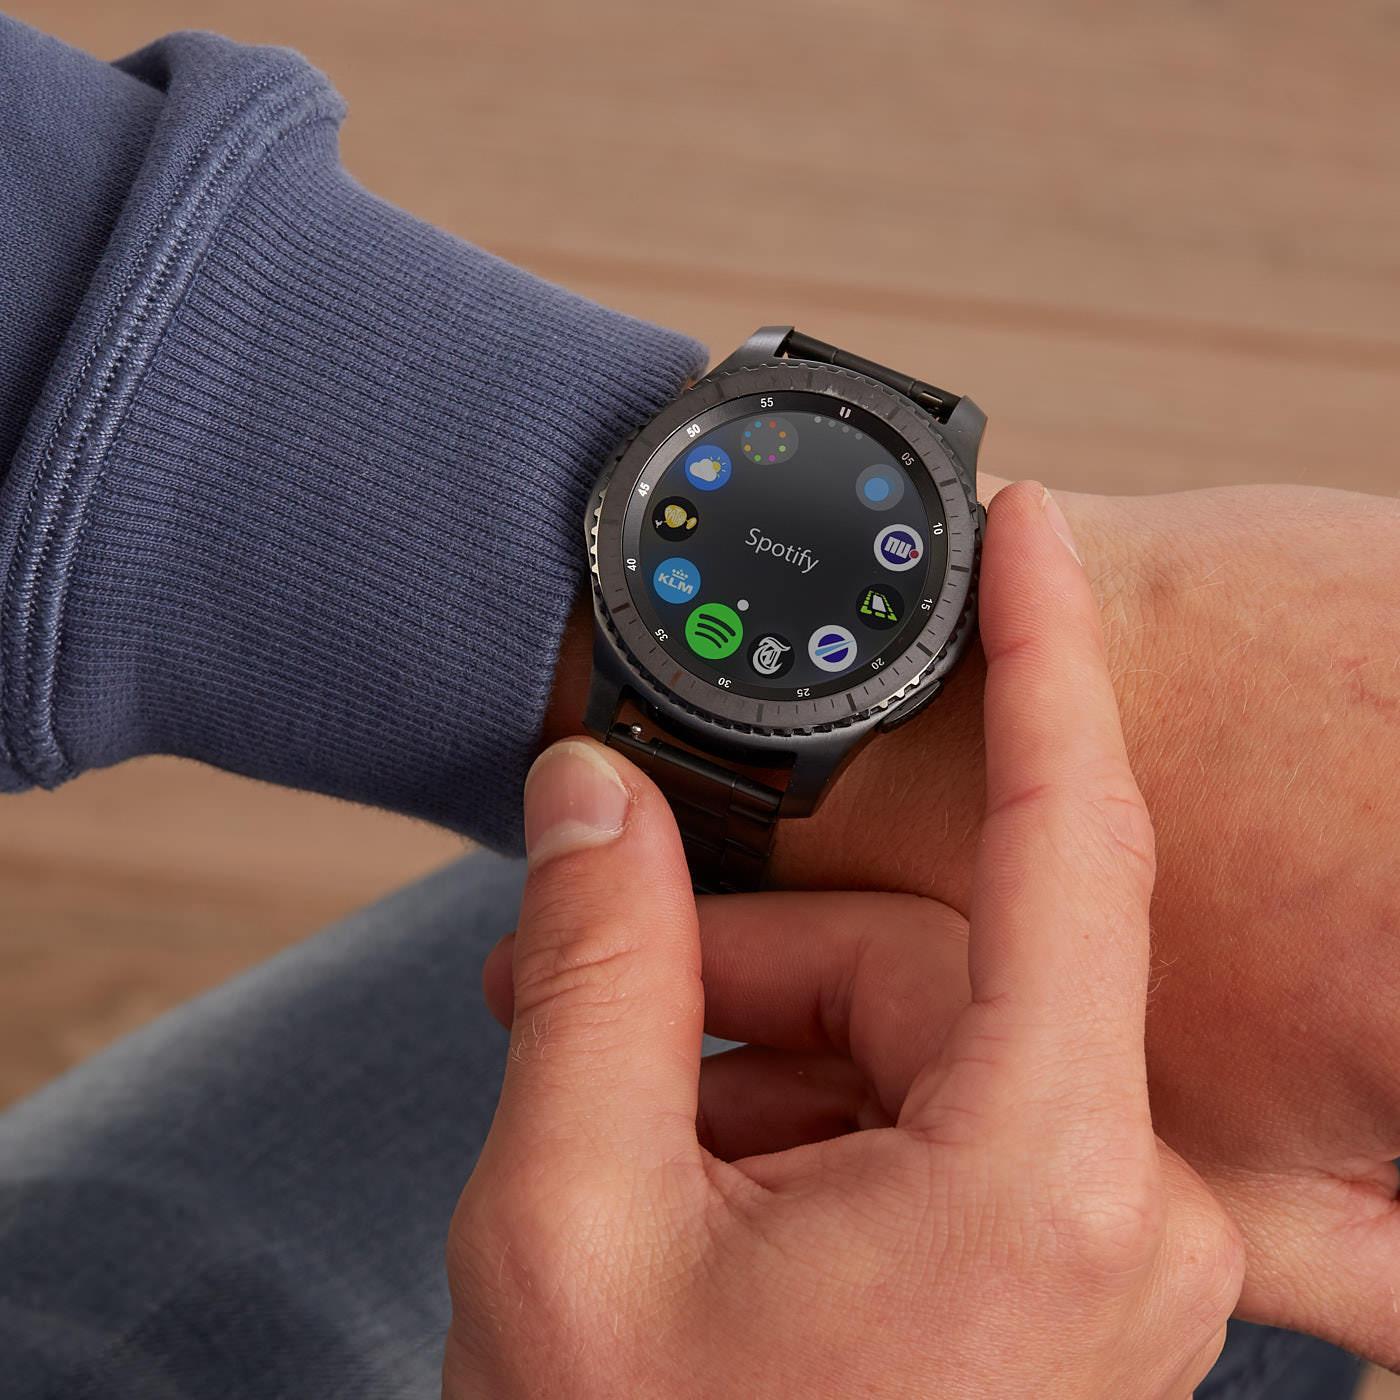 Samsung Special Edition Gear S3 Frontier Smartwatch SA.S3FRDG